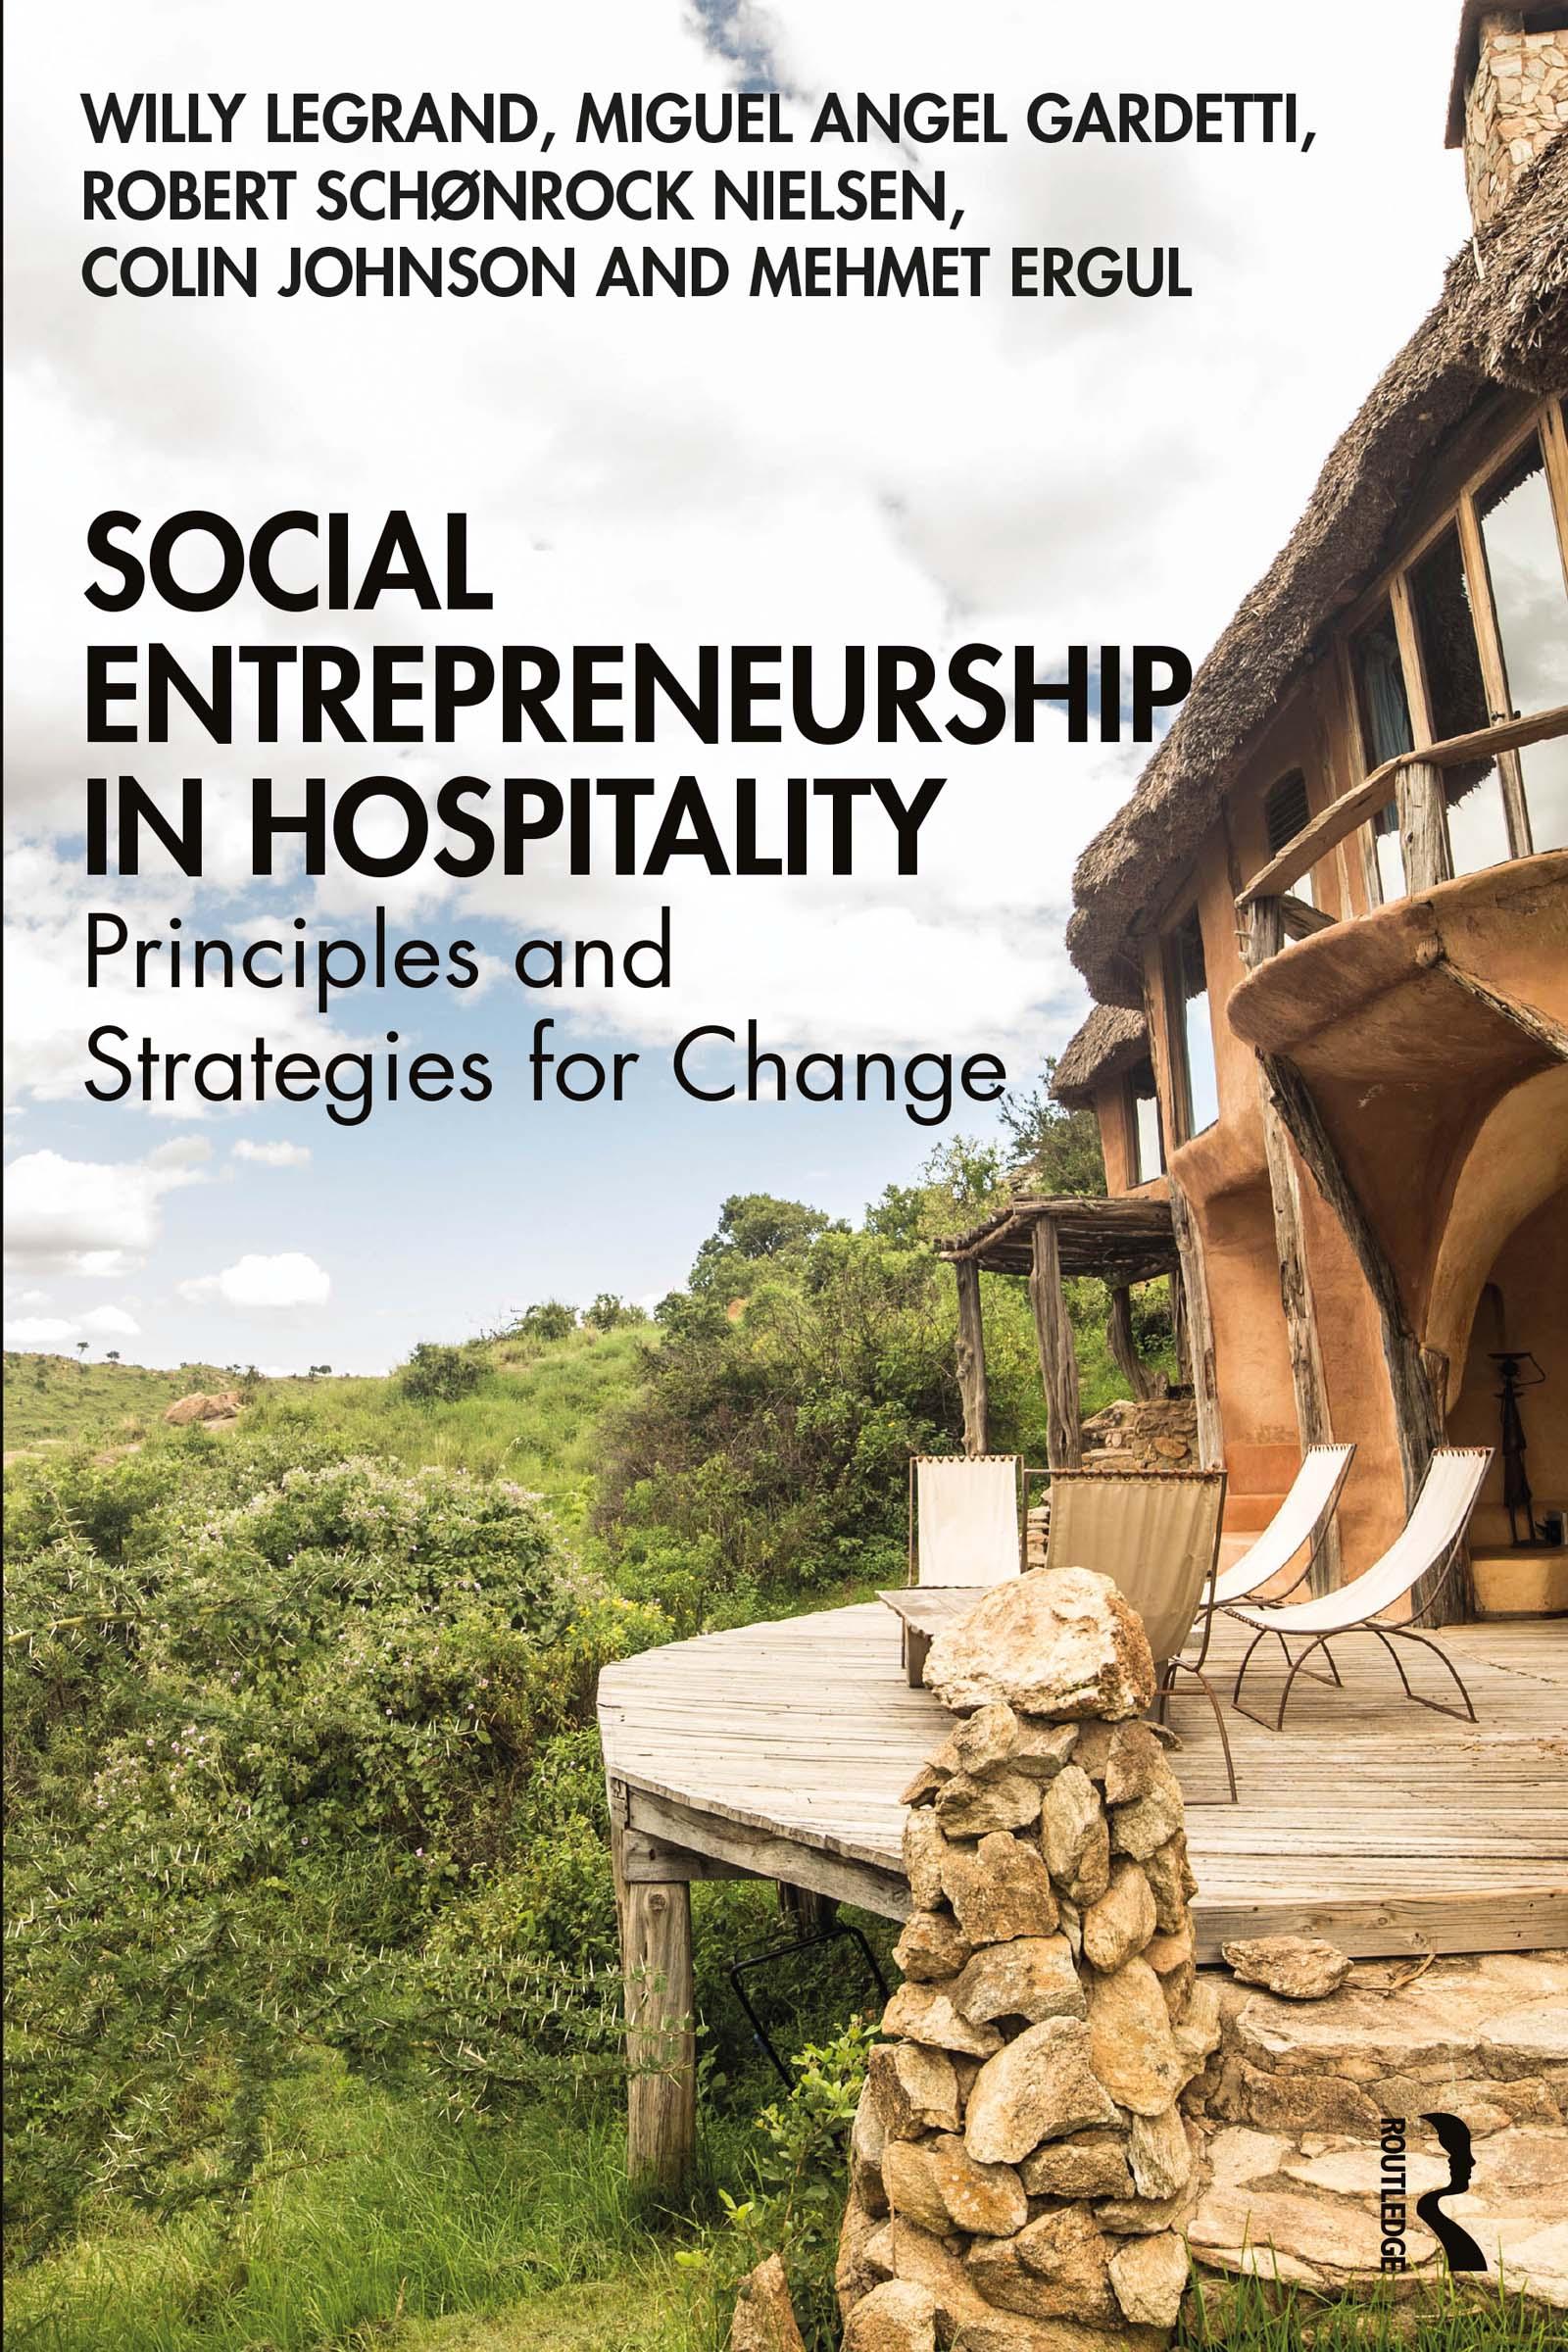 Social entrepreneurship: definitions and concepts